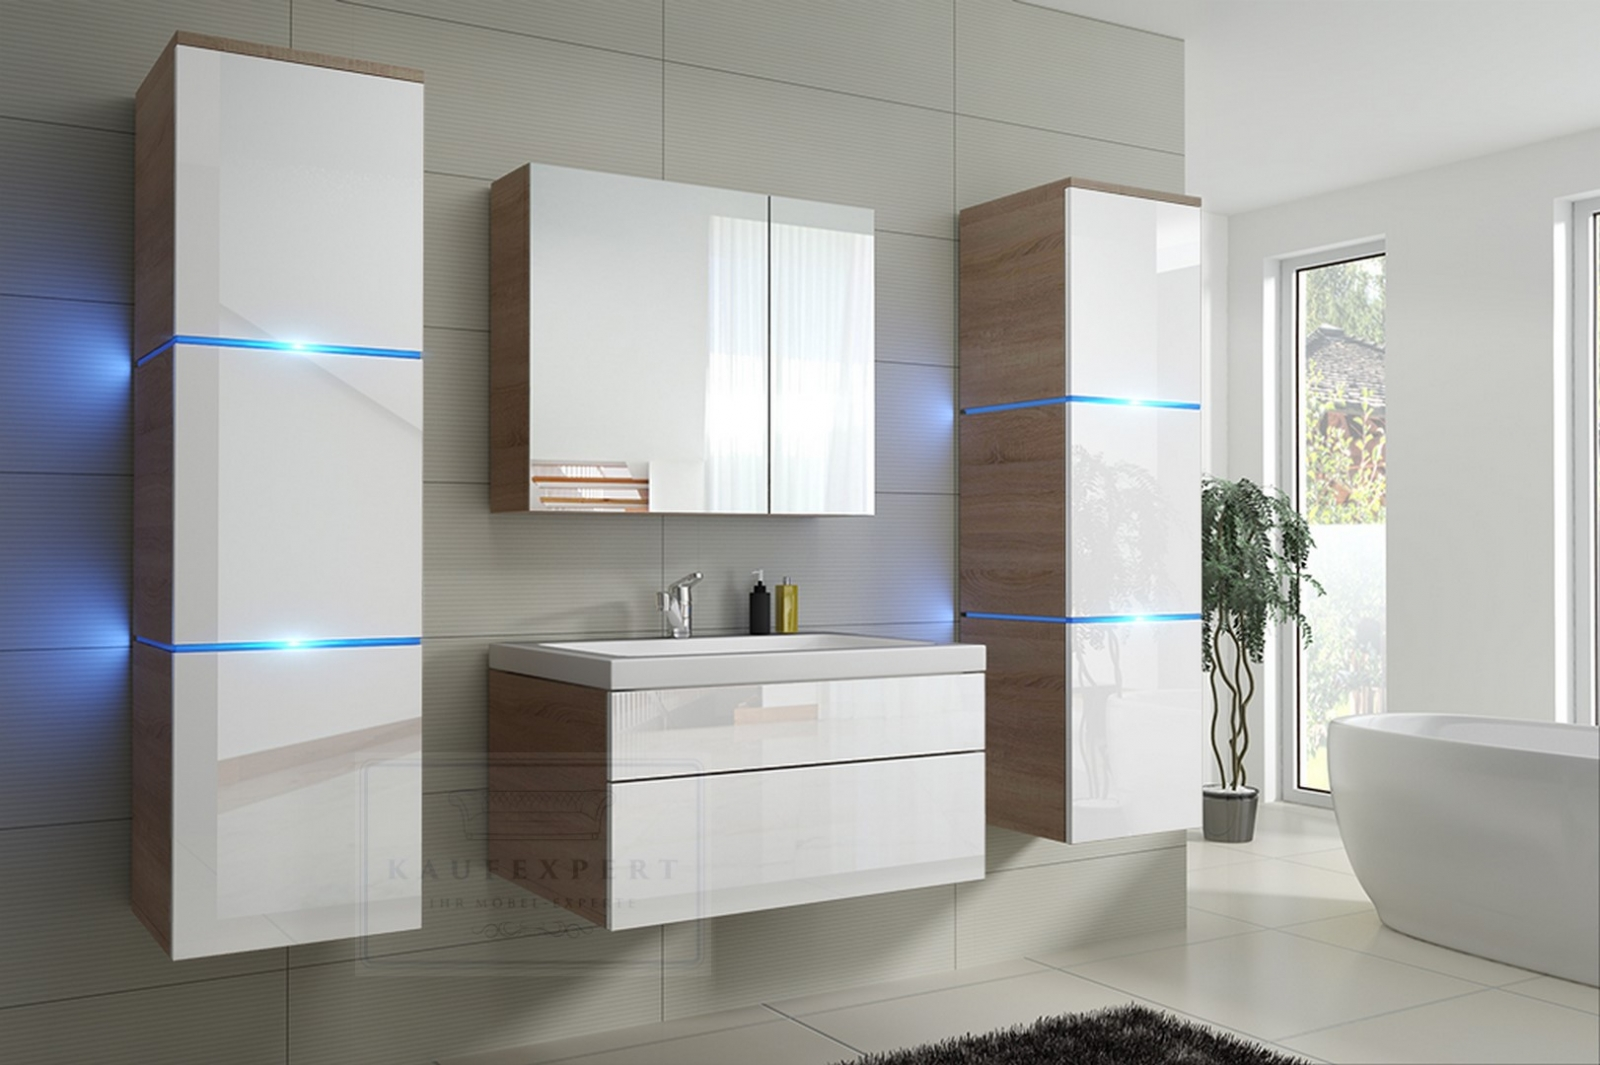 kaufexpert badm bel set lux new grau hochglanz wei keramik waschbecken badezimmer led. Black Bedroom Furniture Sets. Home Design Ideas